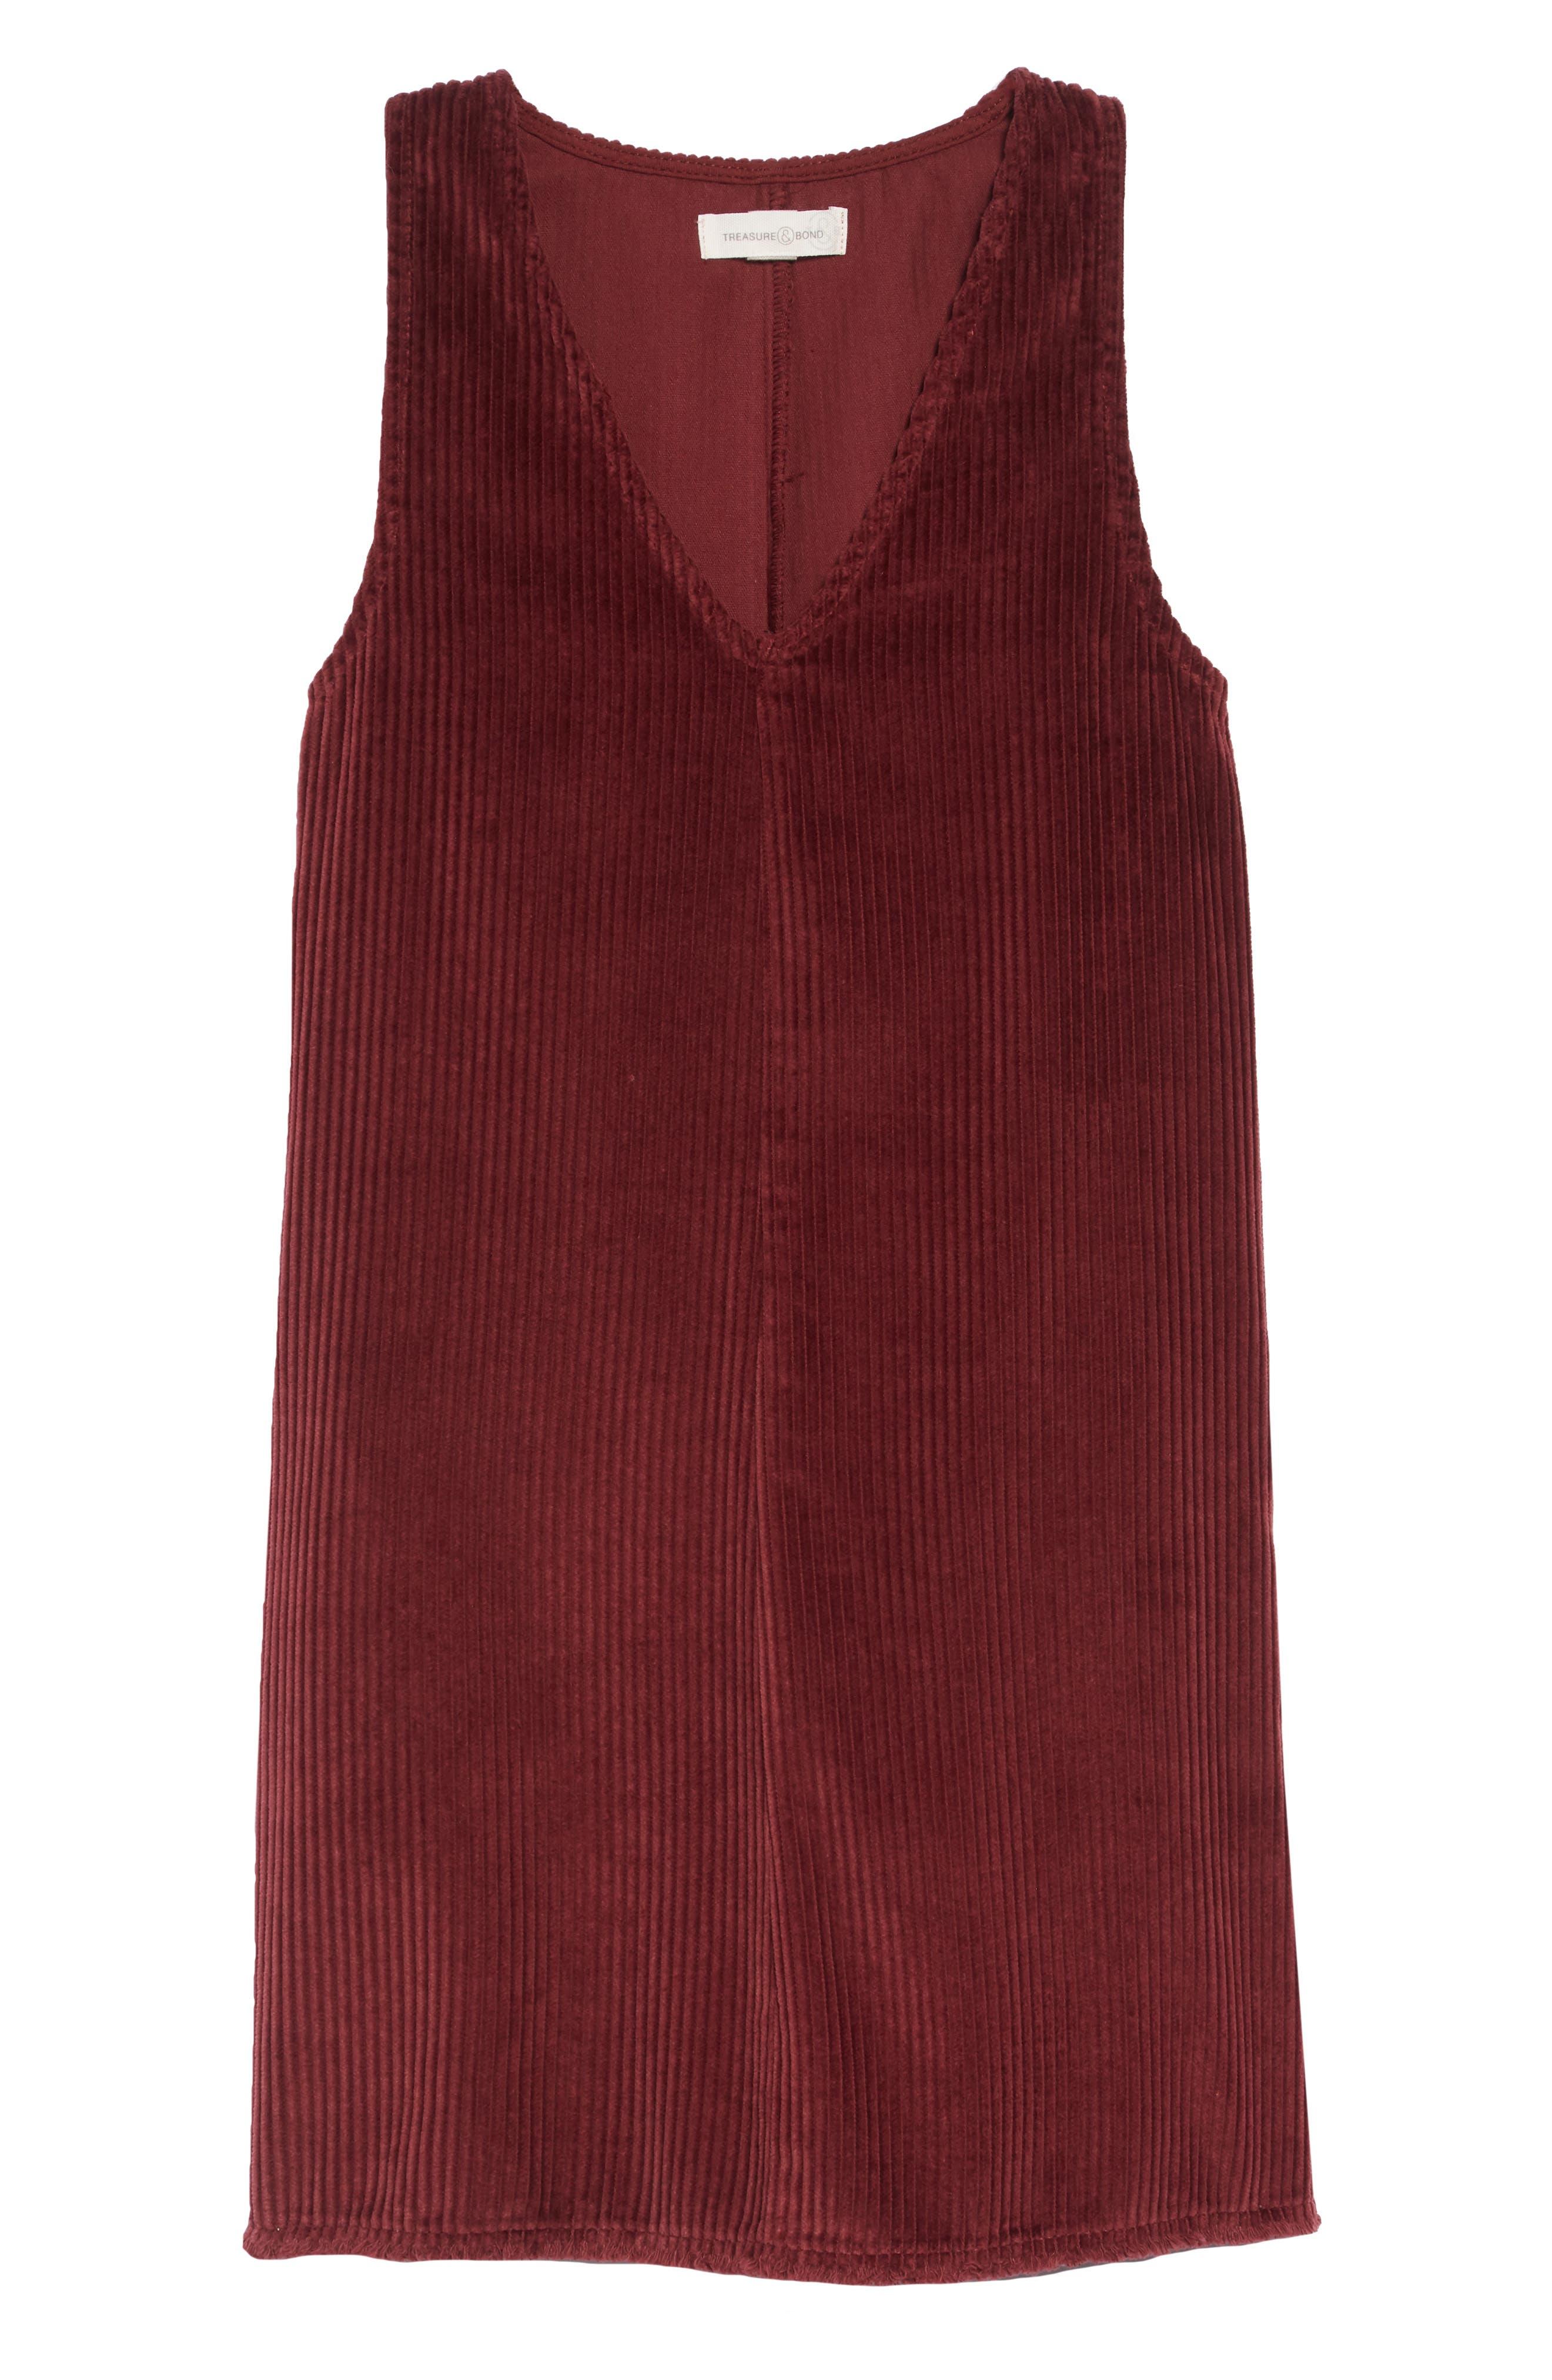 TREASURE & BOND,                             Corduroy Jumper Dress,                             Main thumbnail 1, color,                             601